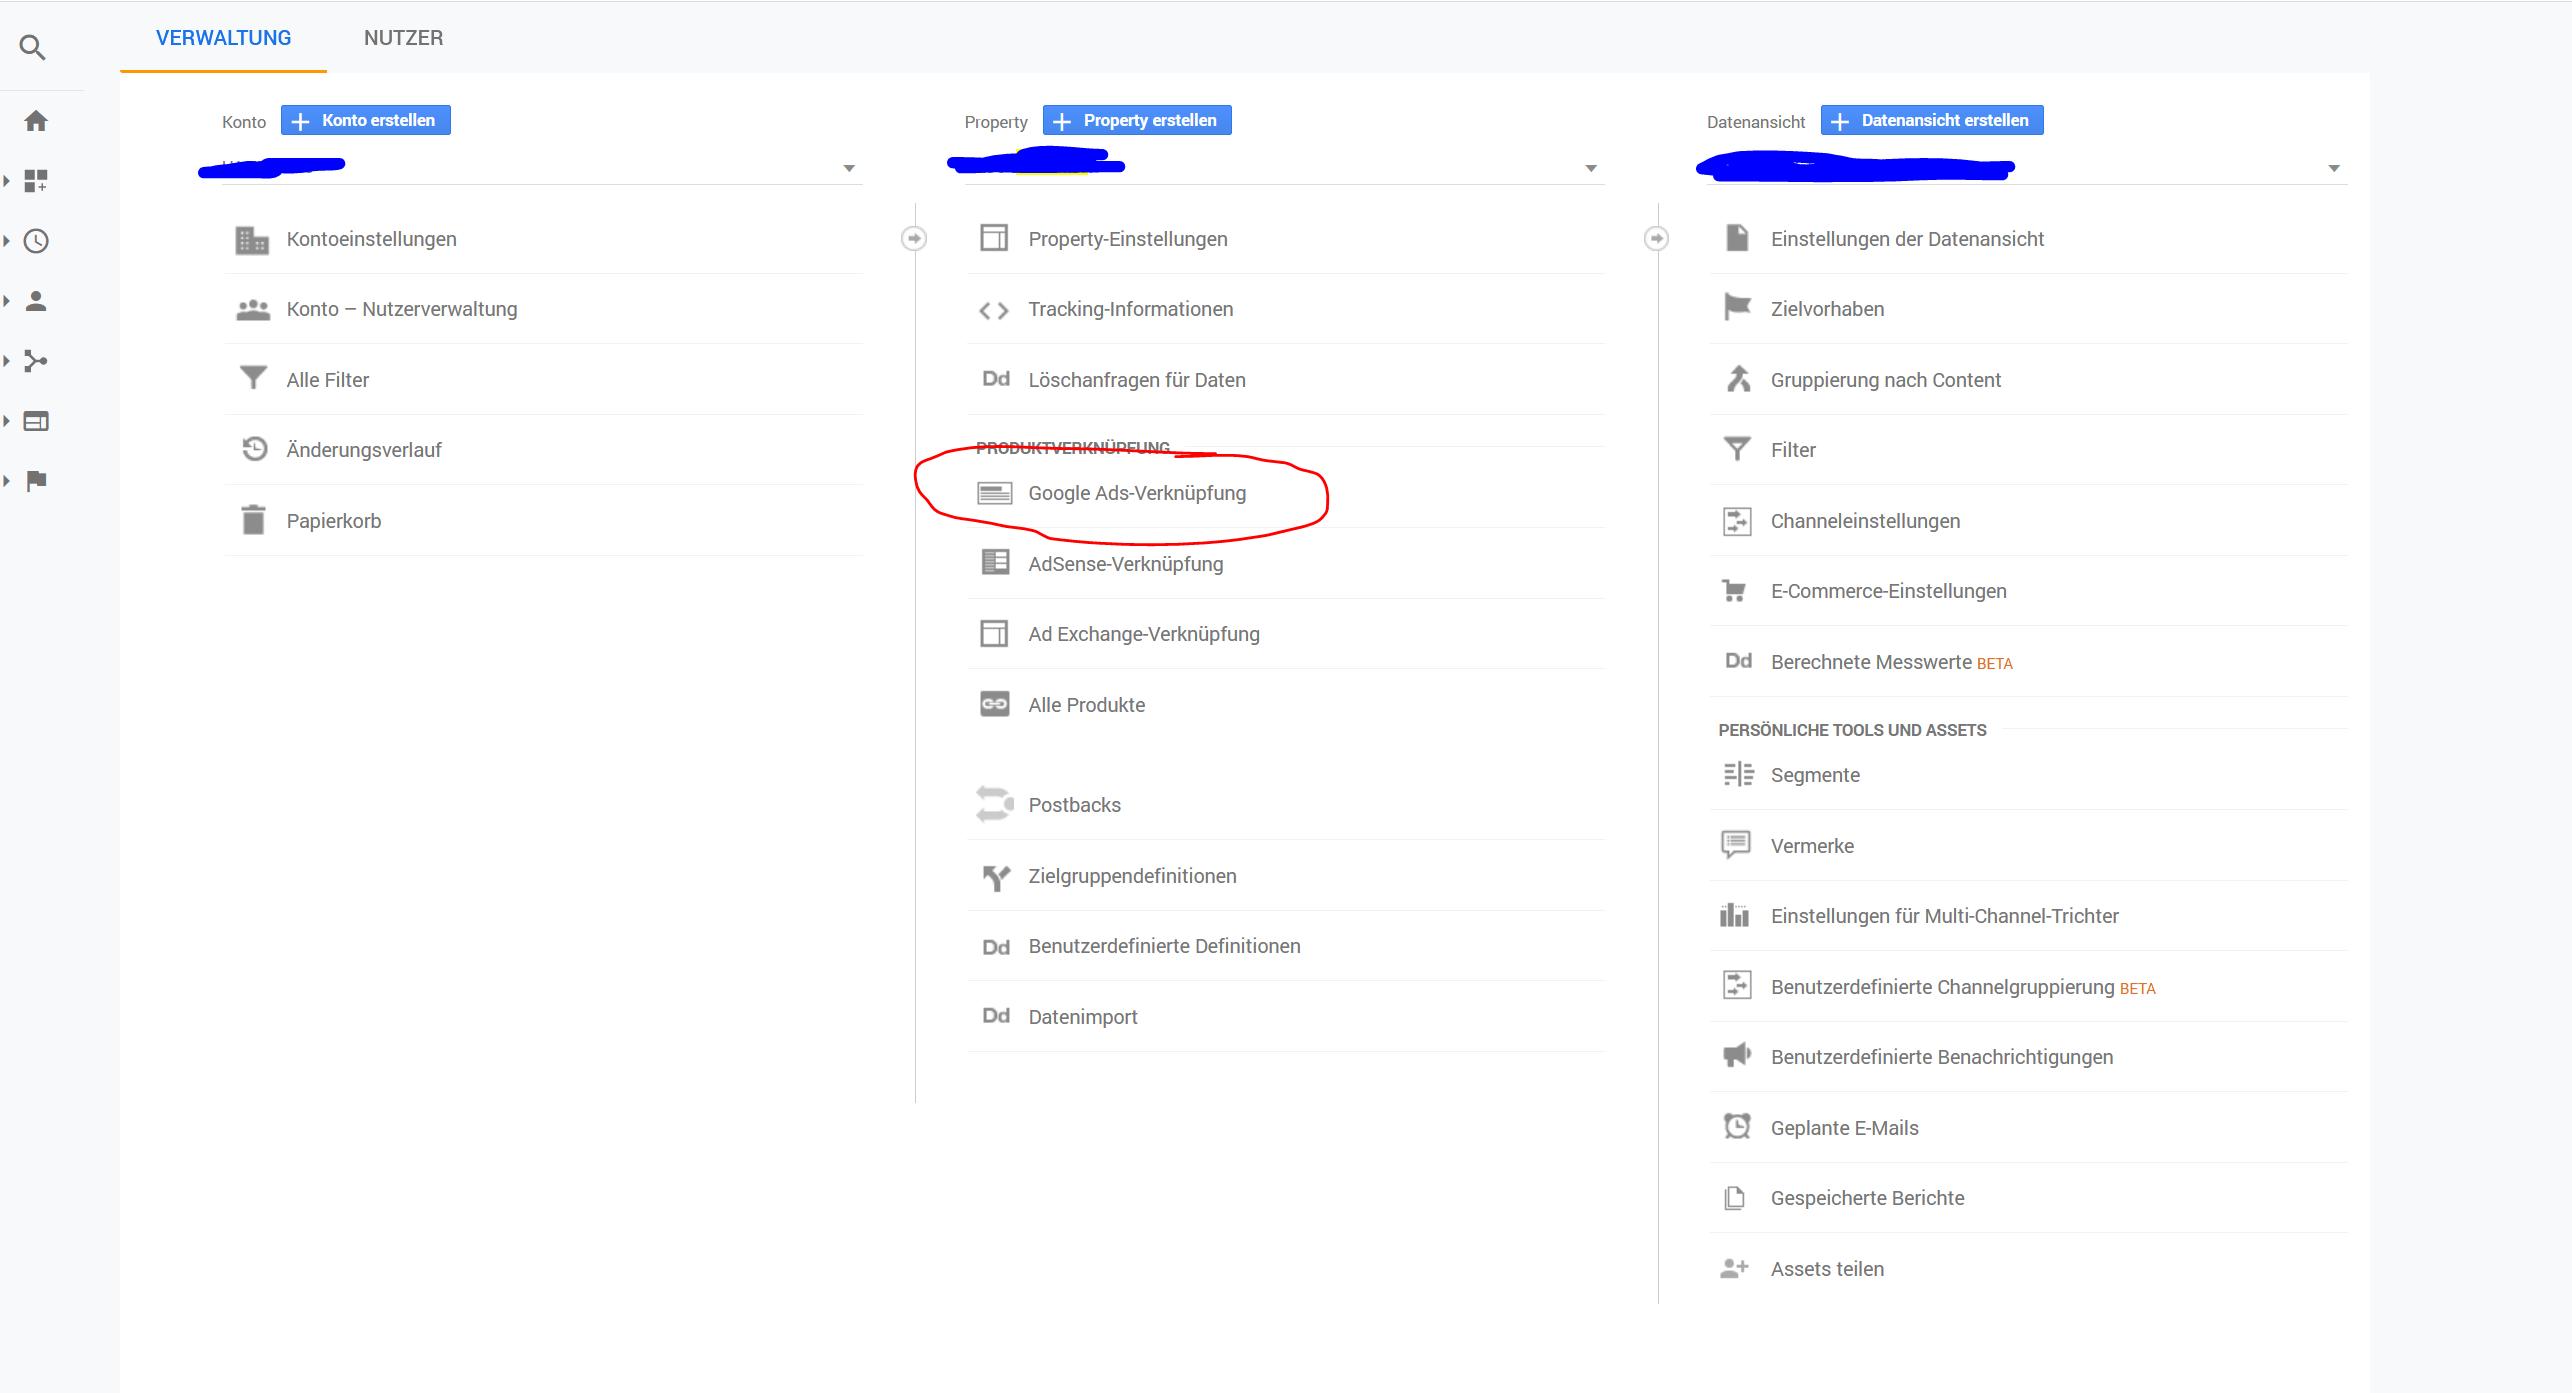 Google Ads Verknuepfung